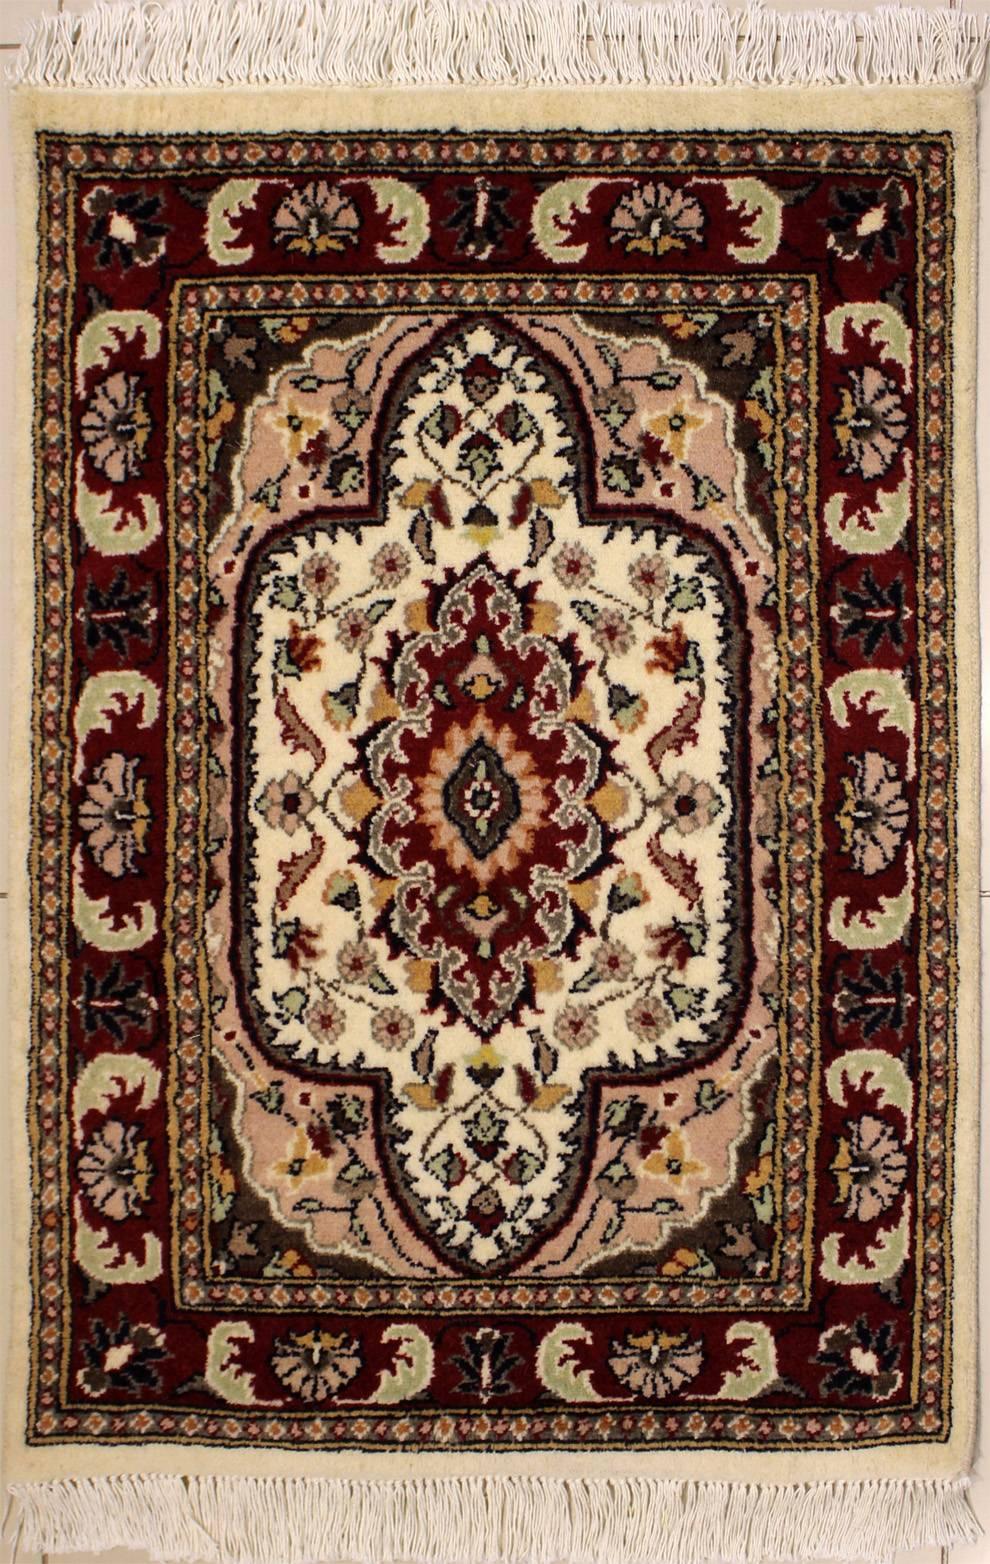 2 0x3 0 Rug Fl Handmade Pak Persian High Quality Rugs A 2x3 Size Rugstc